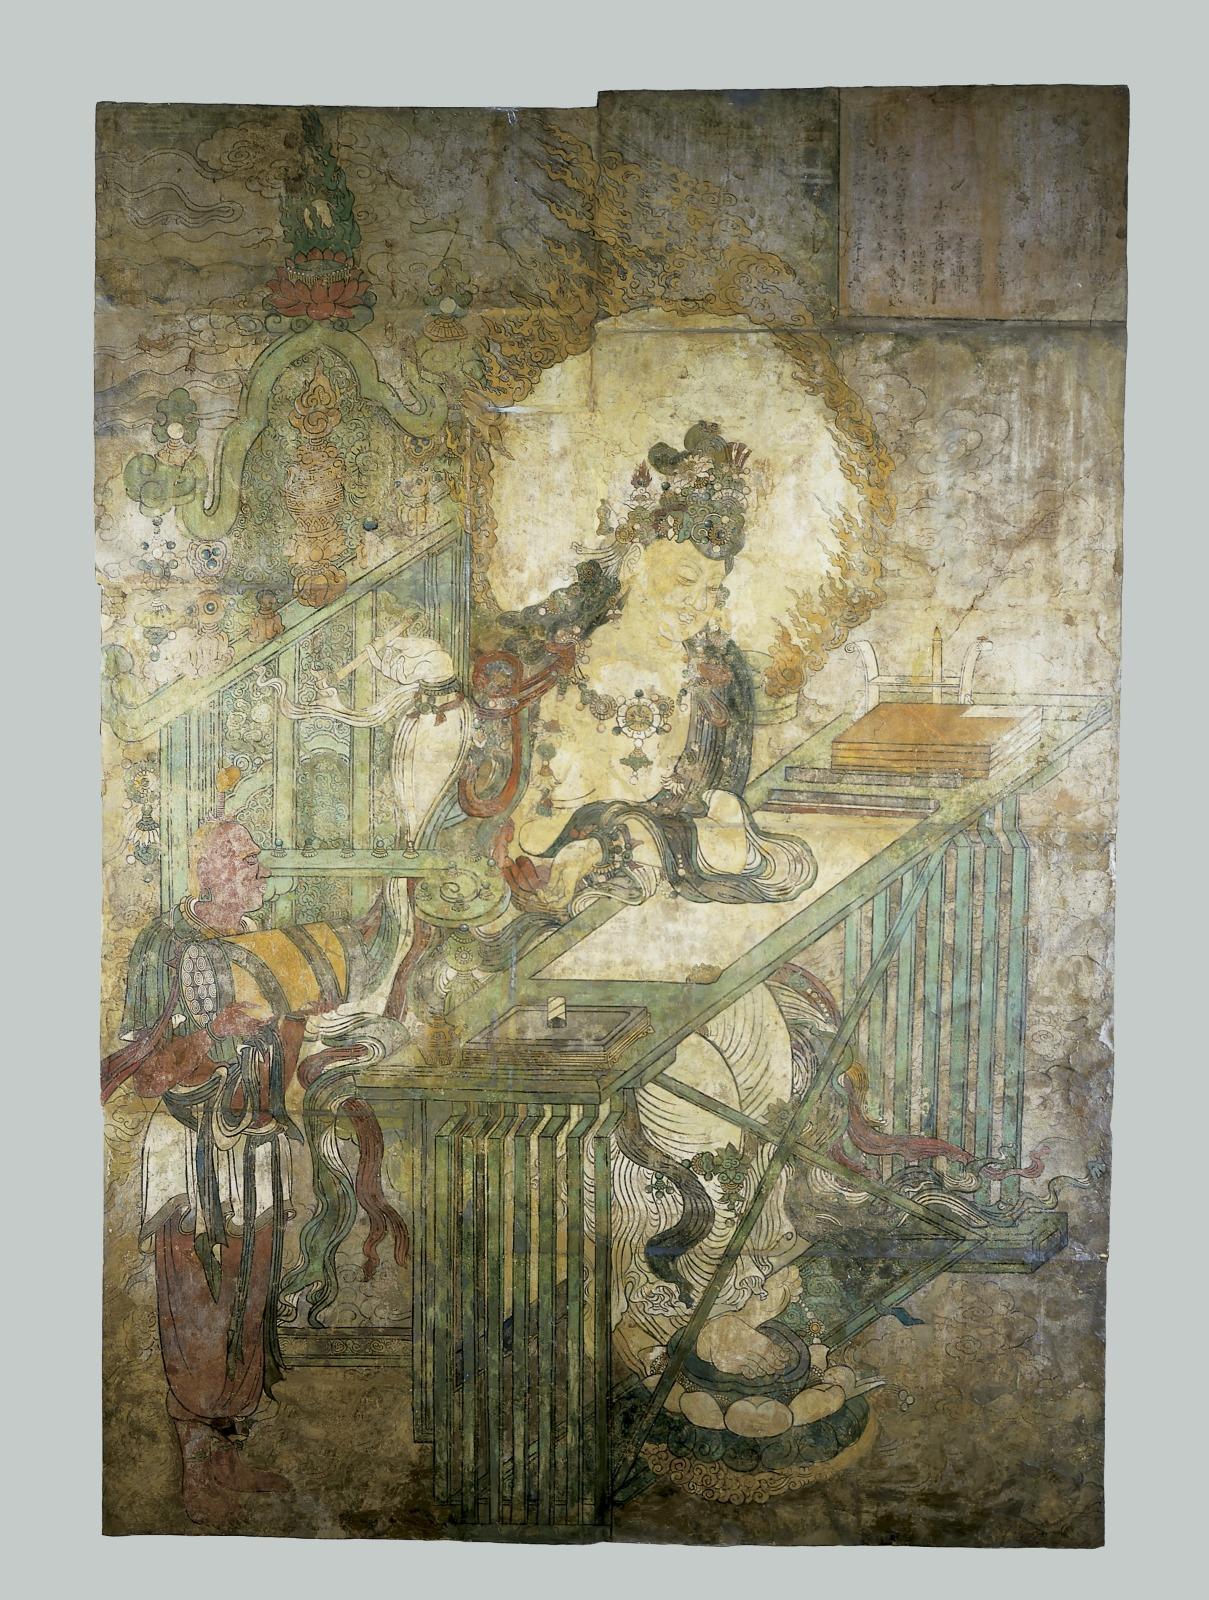 Wenshu, Bodhisattva of Wisdom at a Writing Table